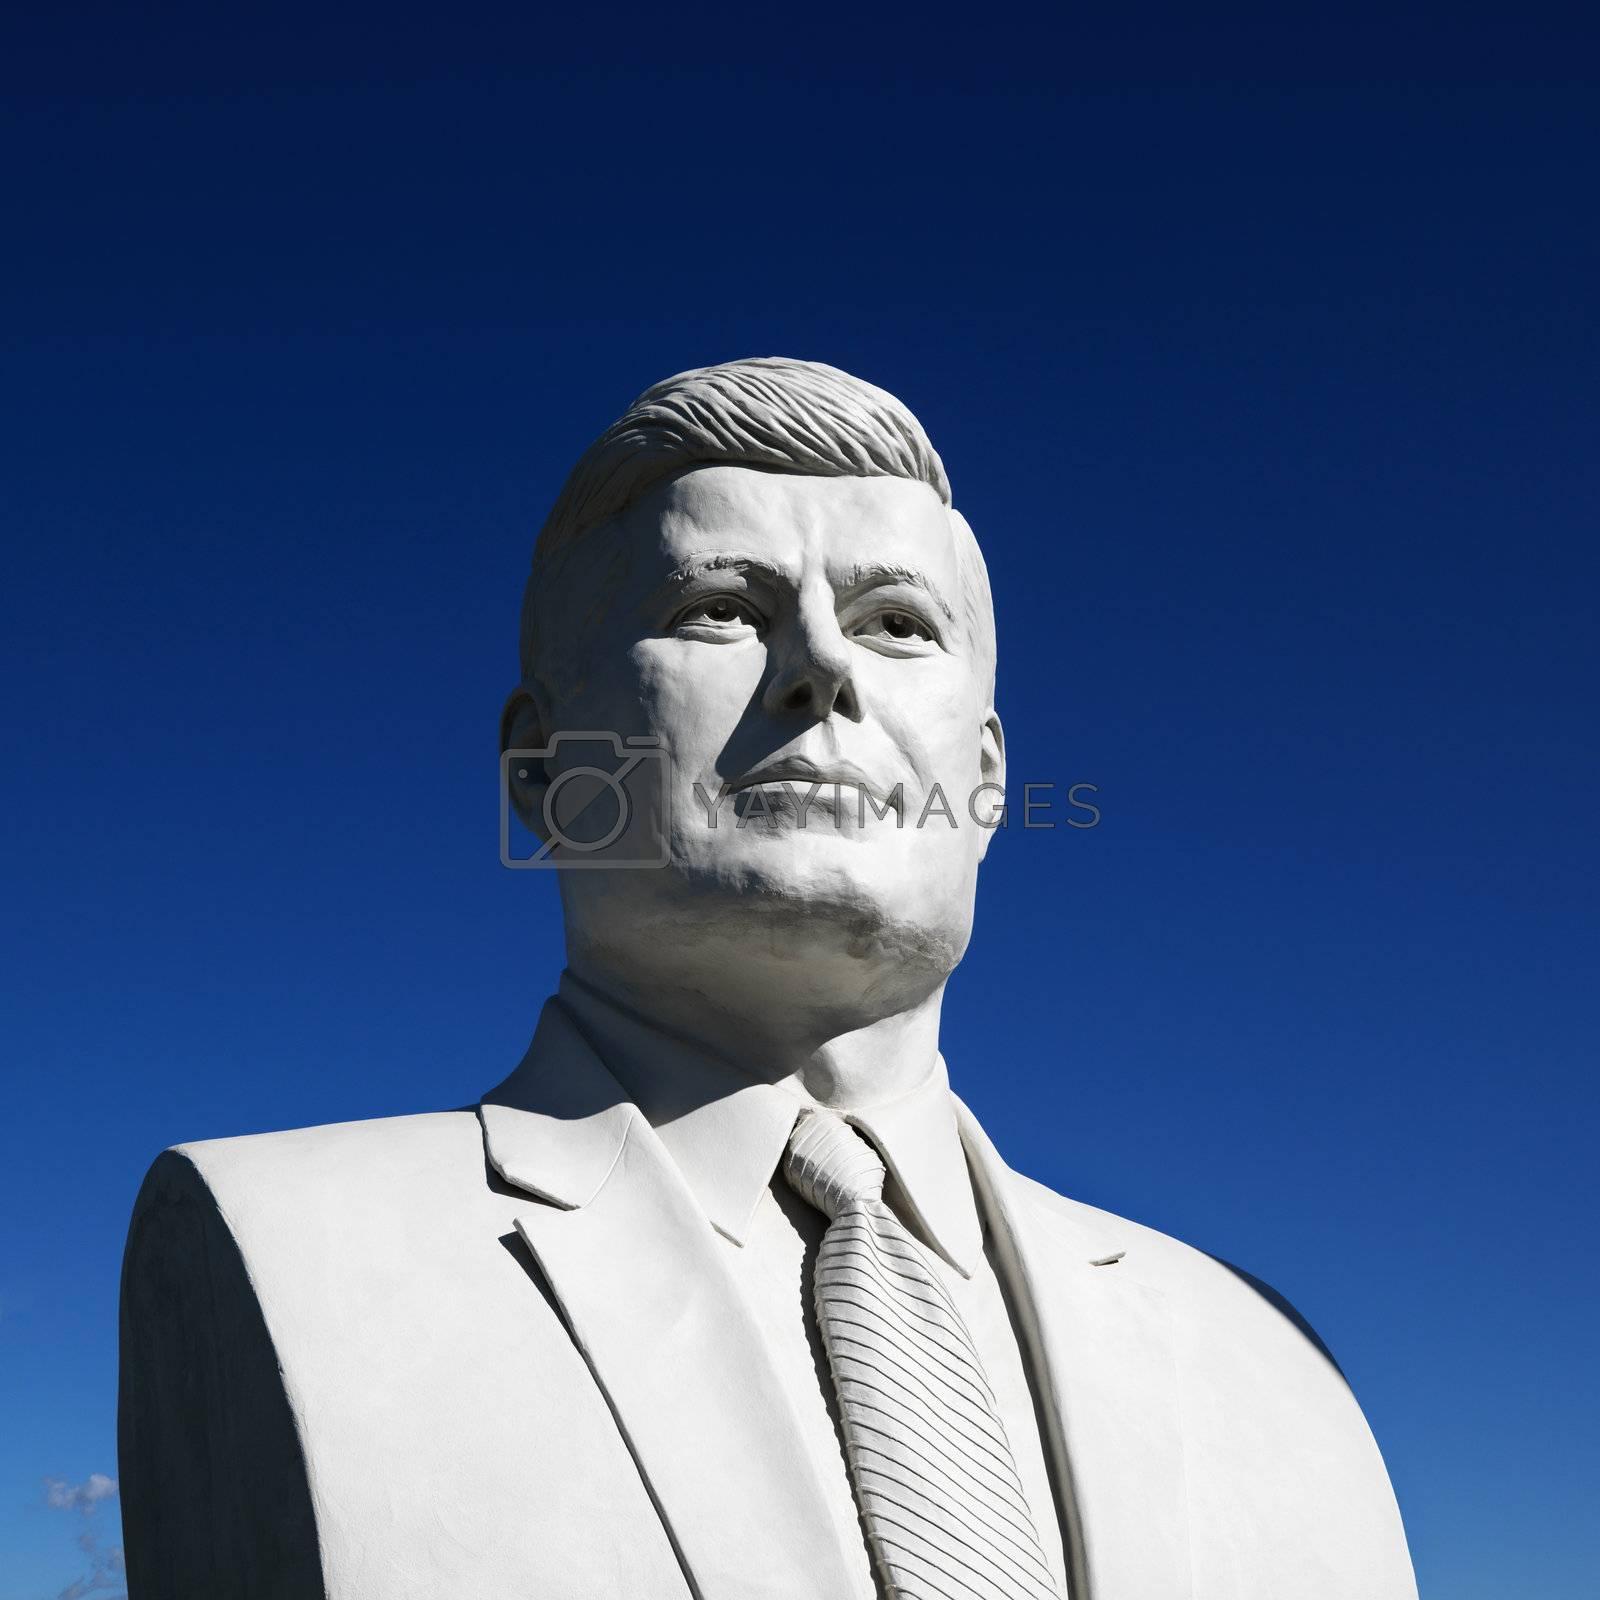 JFK sculpture. by iofoto